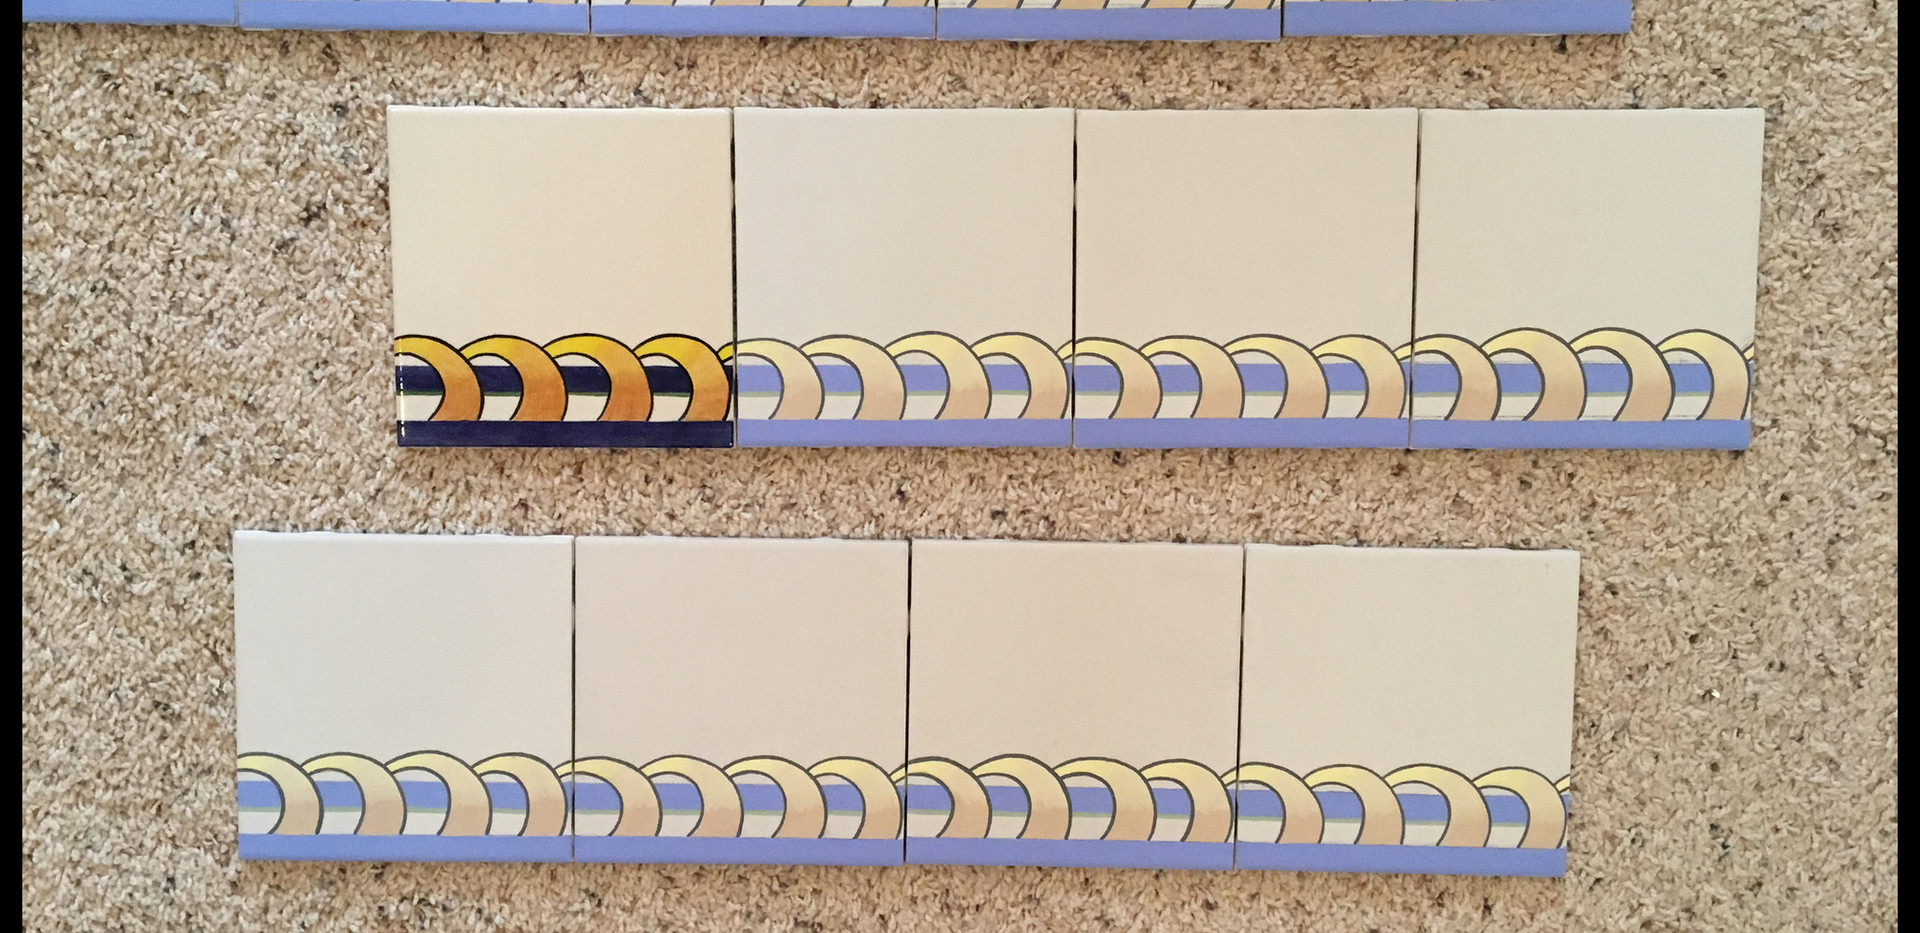 brunchies-cafe-border-tiles-wall-handpai